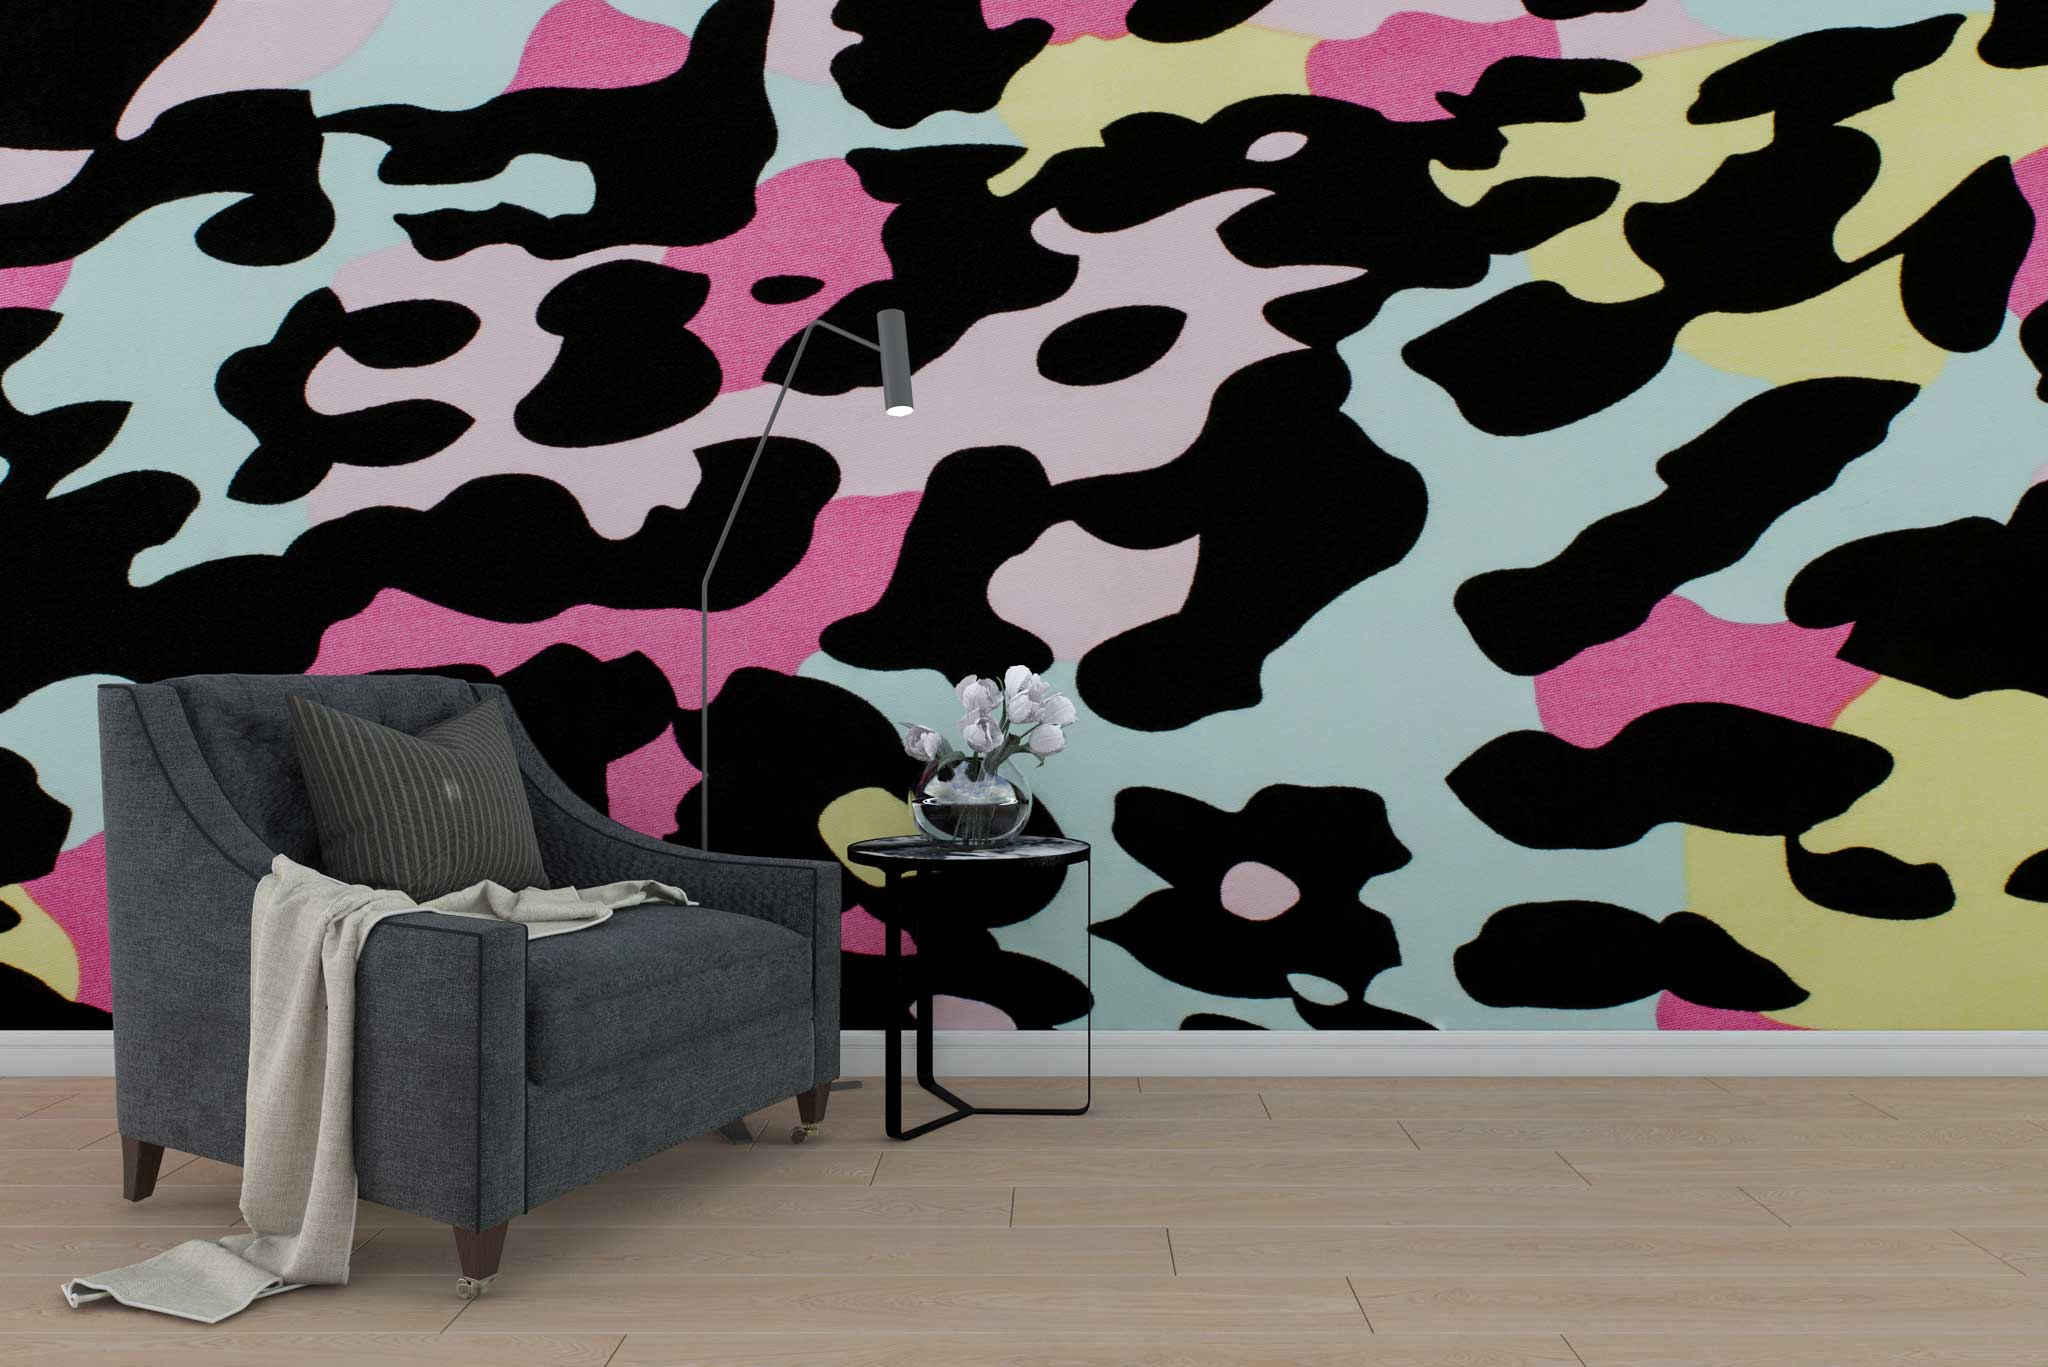 tapet-fototapet-special-personalizat-customizabil-comanda-bucuresti-daring-prints-model-motiv-animal-print-colorat-leopard-negru-galben-roz-bleu